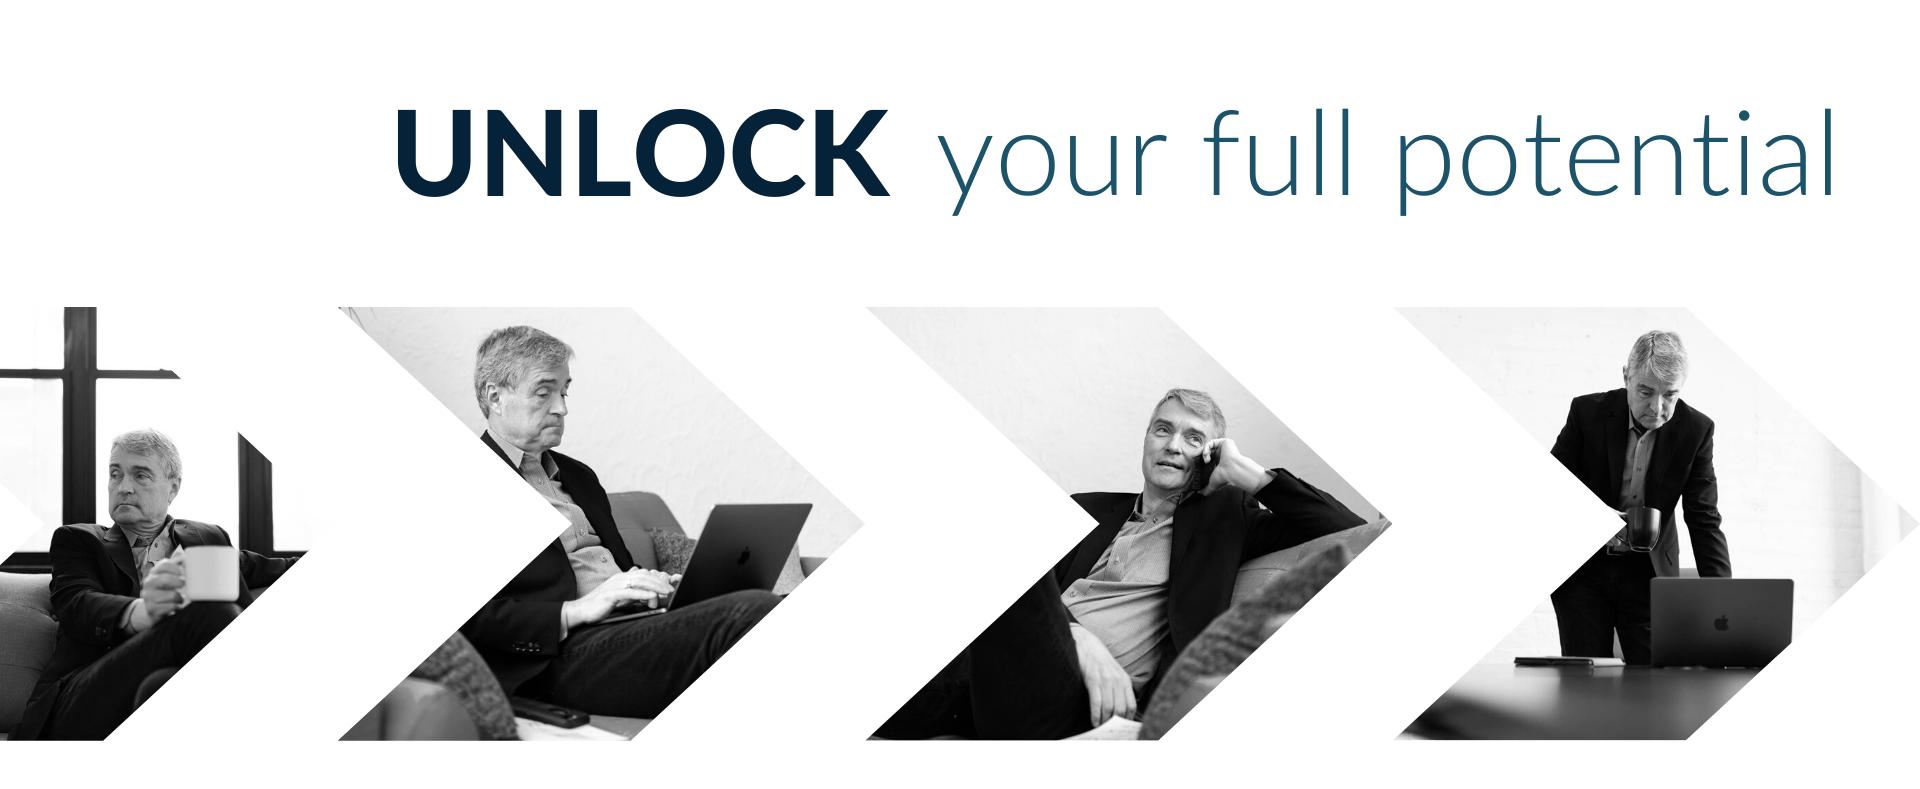 Unlock your full potential